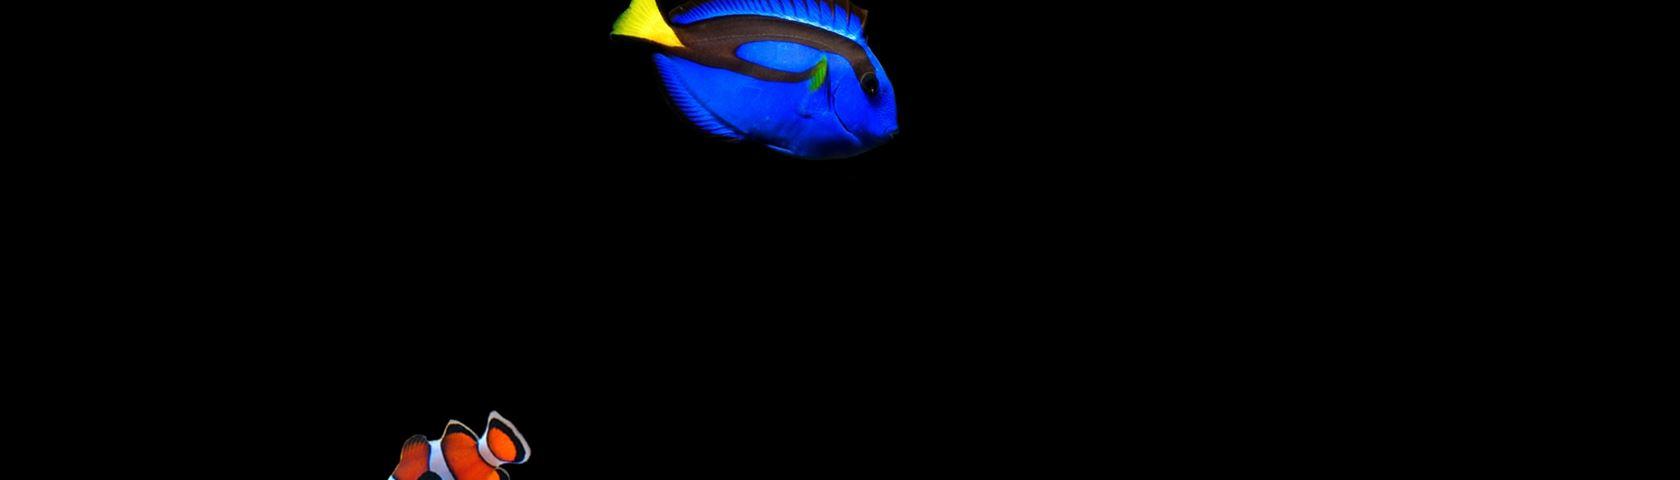 Salt Water Fish 1